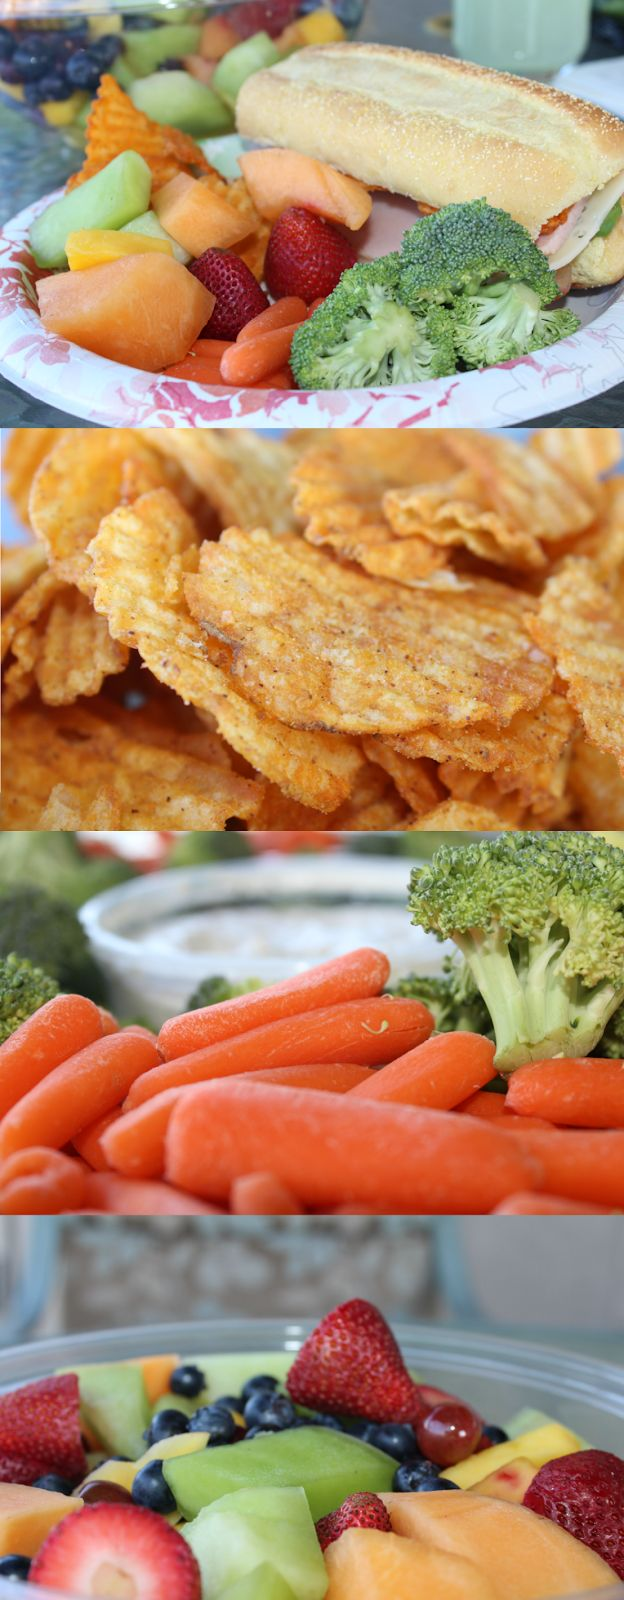 Easy Summer Meal - Turkey Sandwiches, BBQ Chips, Veggie Platter, Fruit ...